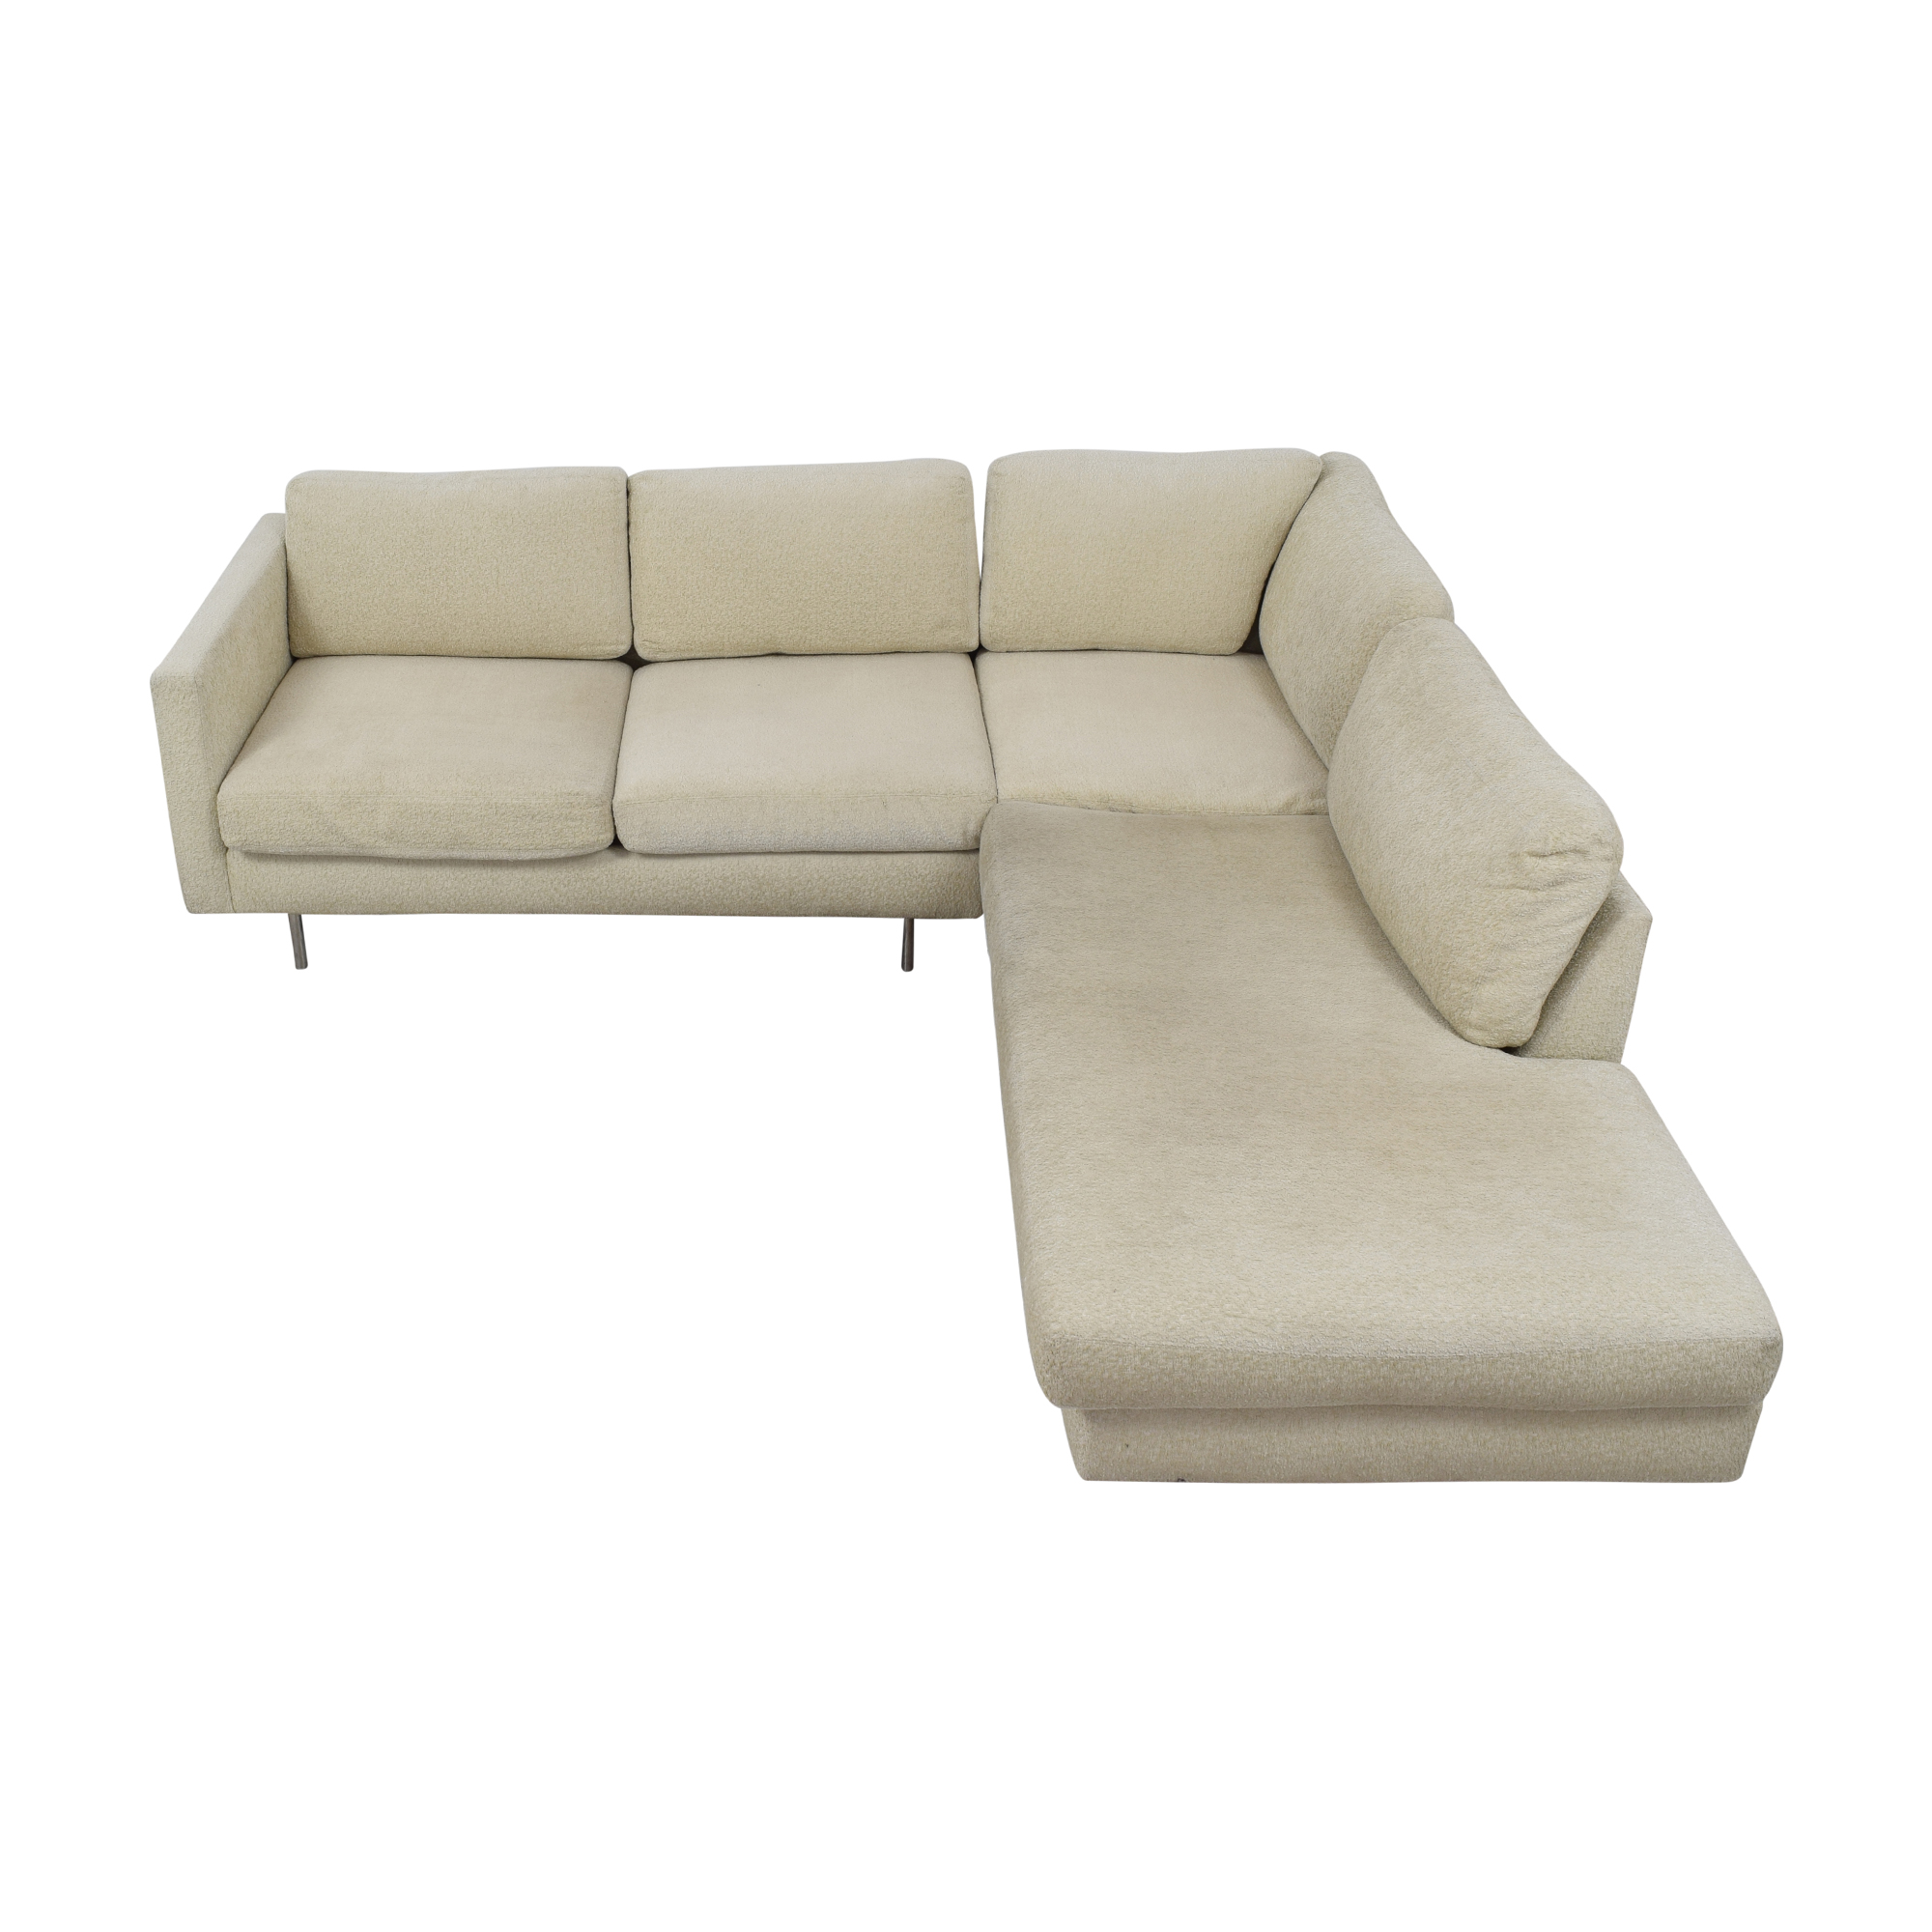 Thayer Coggin Milo Baughman Design Classic Sectional Sofa / Sofas